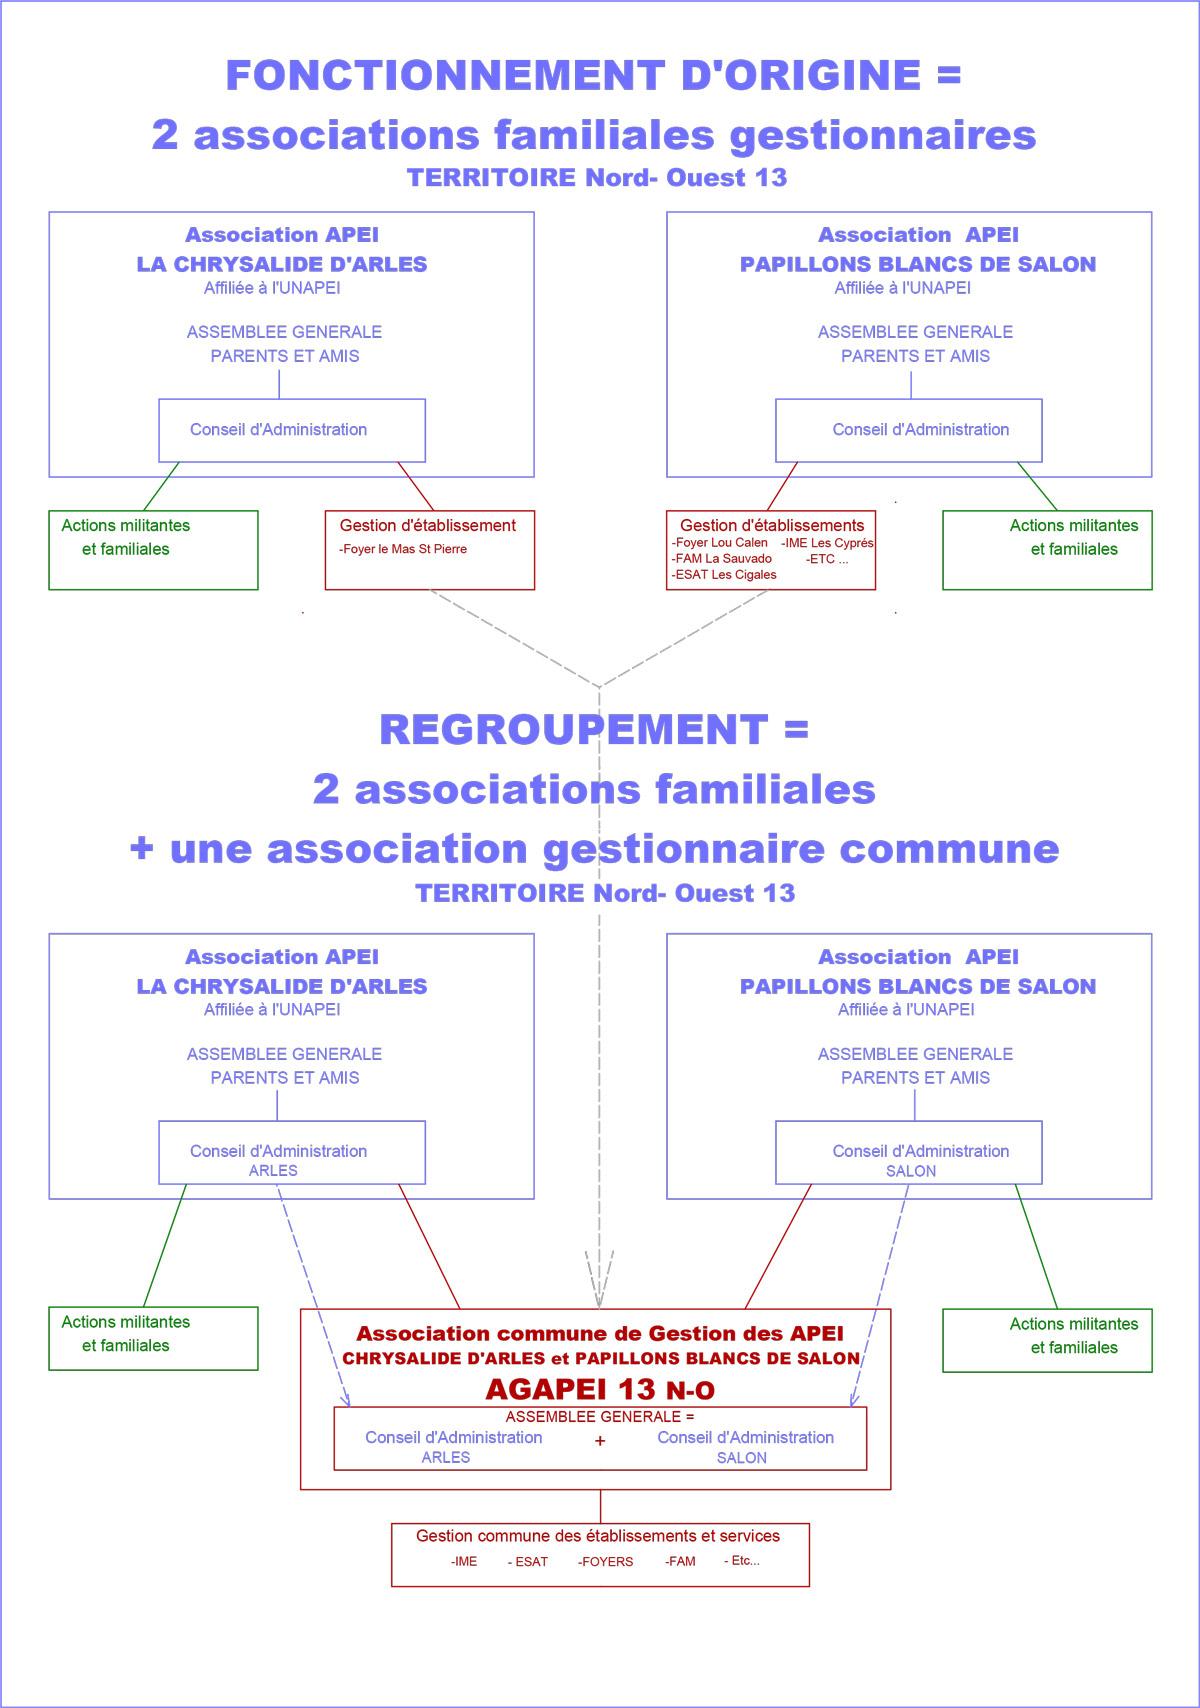 ORGANIGRAMME-REGROUPEMENT